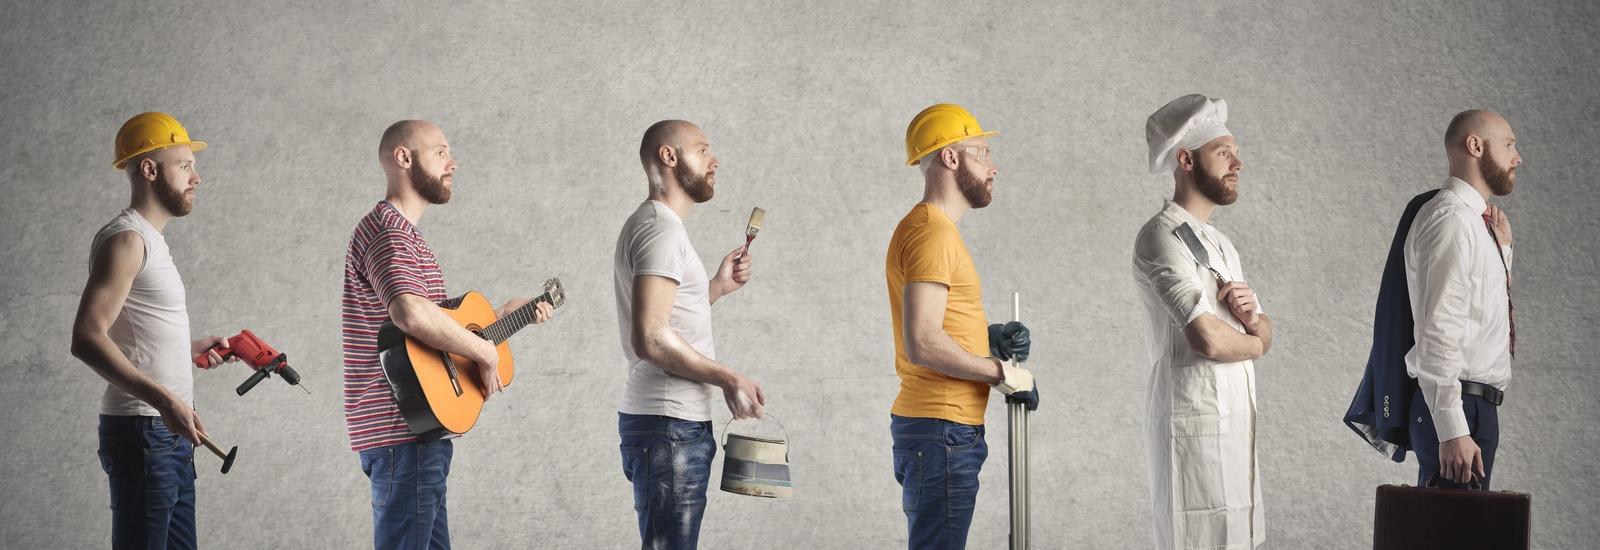 Formation, innovation, changement, emploi, travail